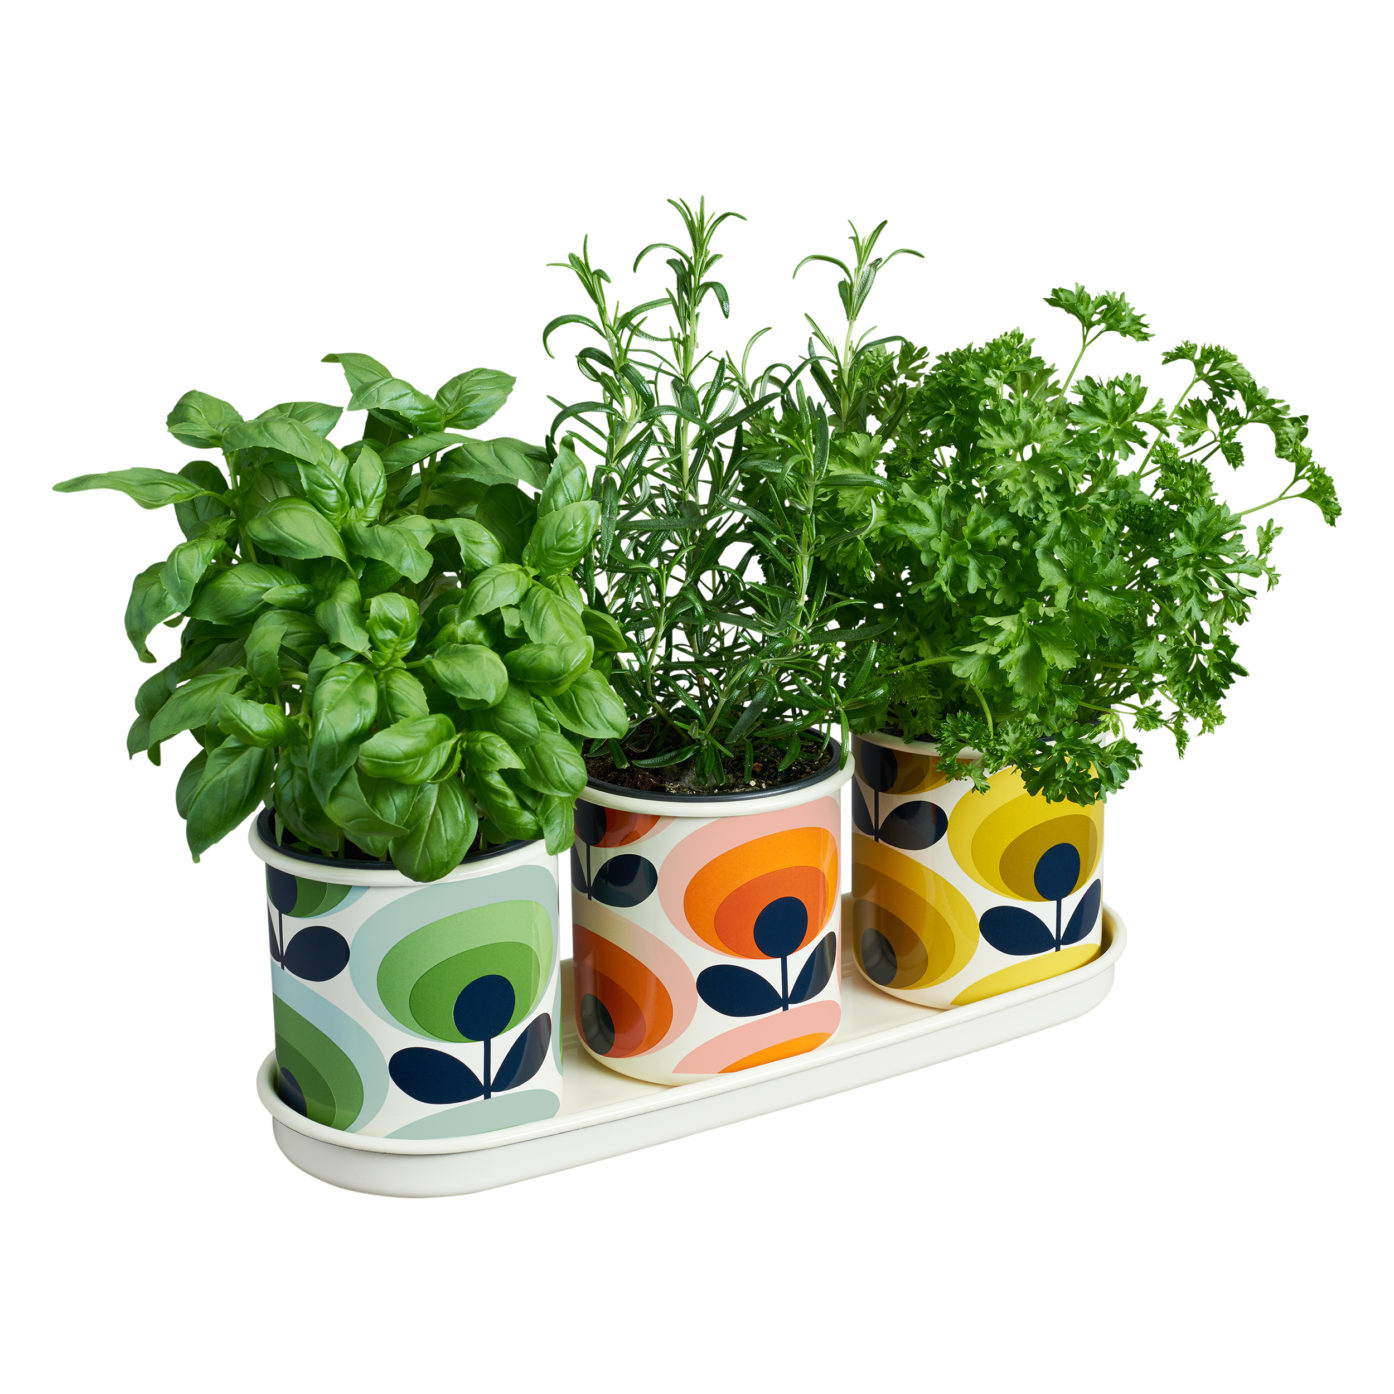 OK Herb Pots Image 2